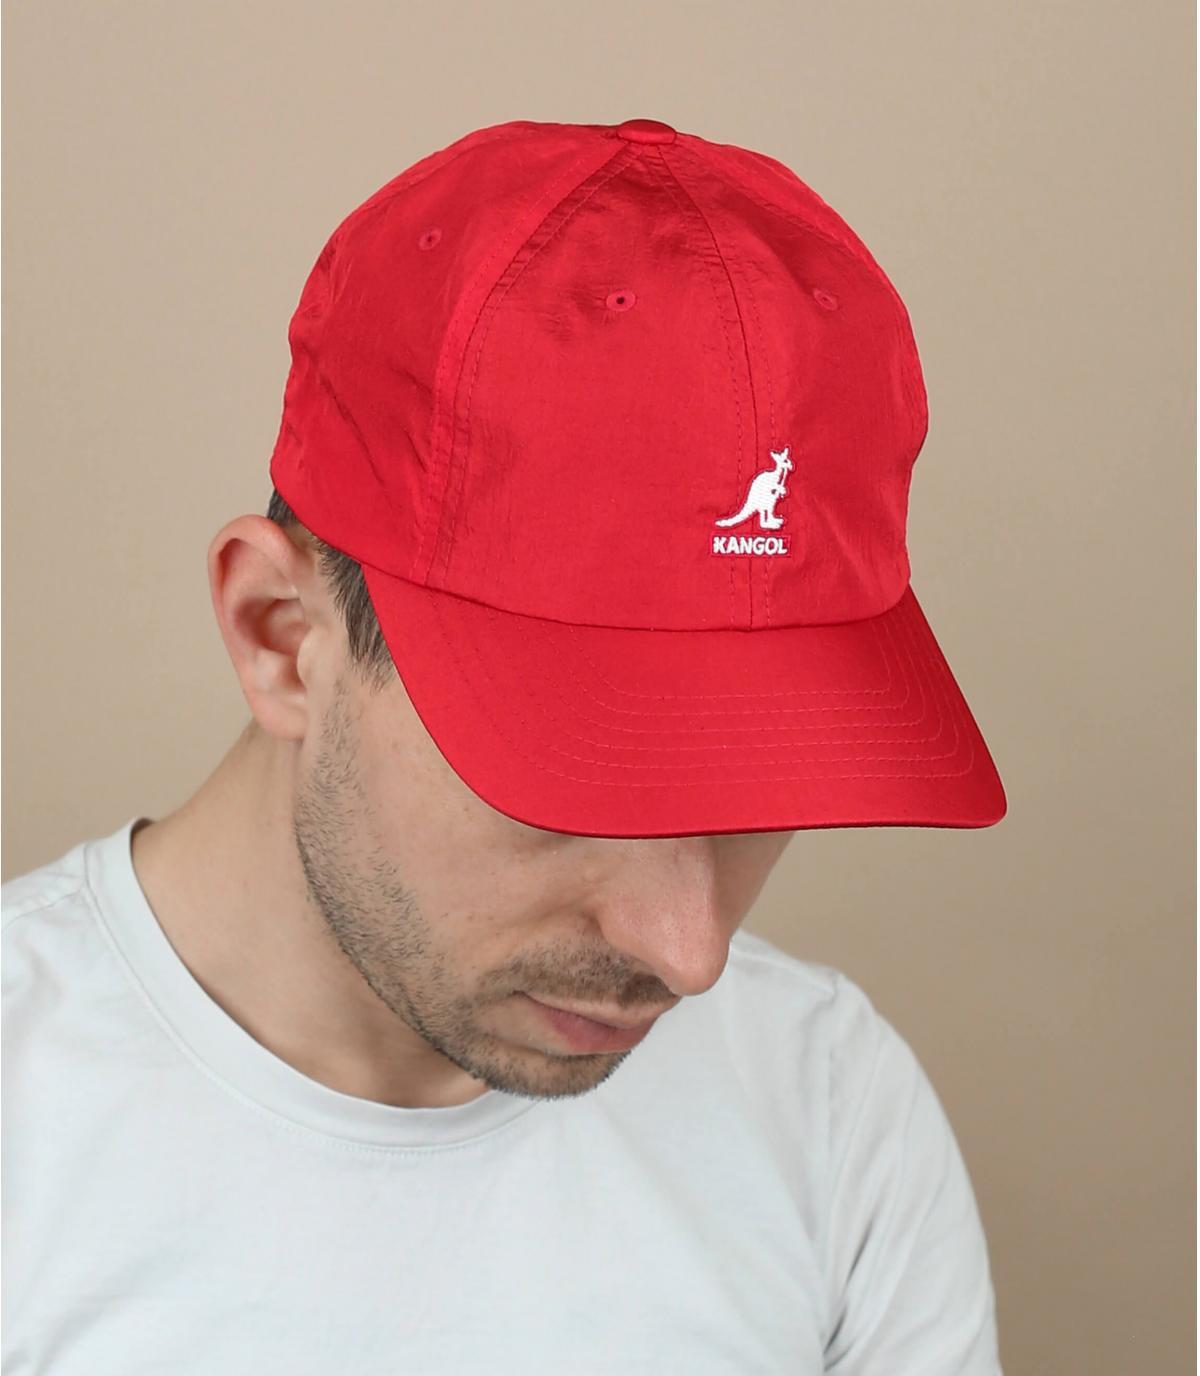 cappellino nylon rosso Kangol